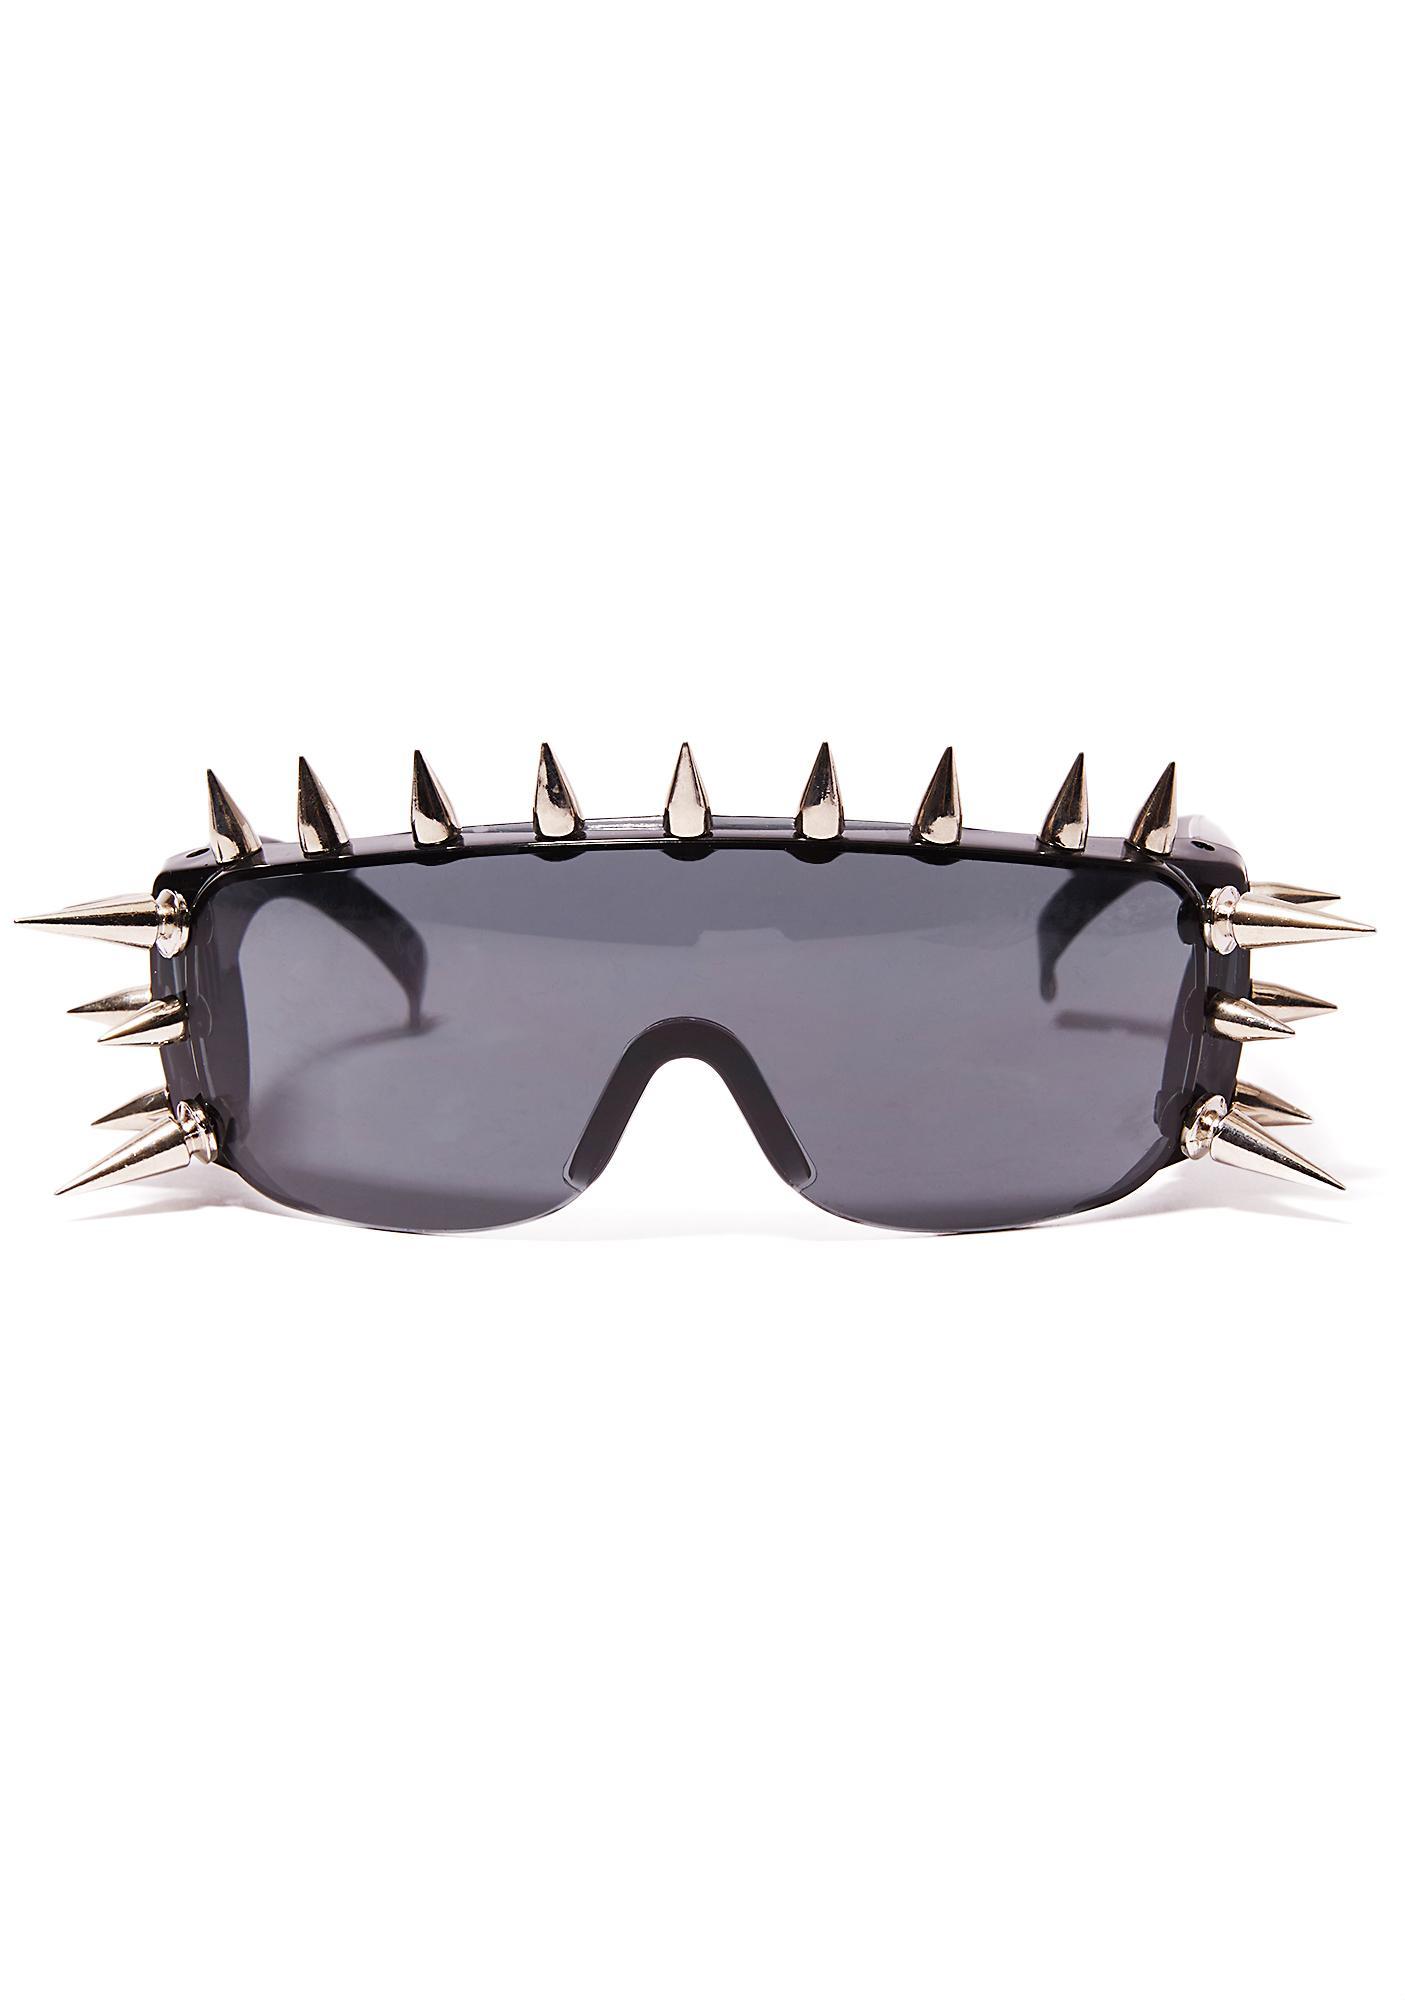 Get Tough Spike Sunglasses